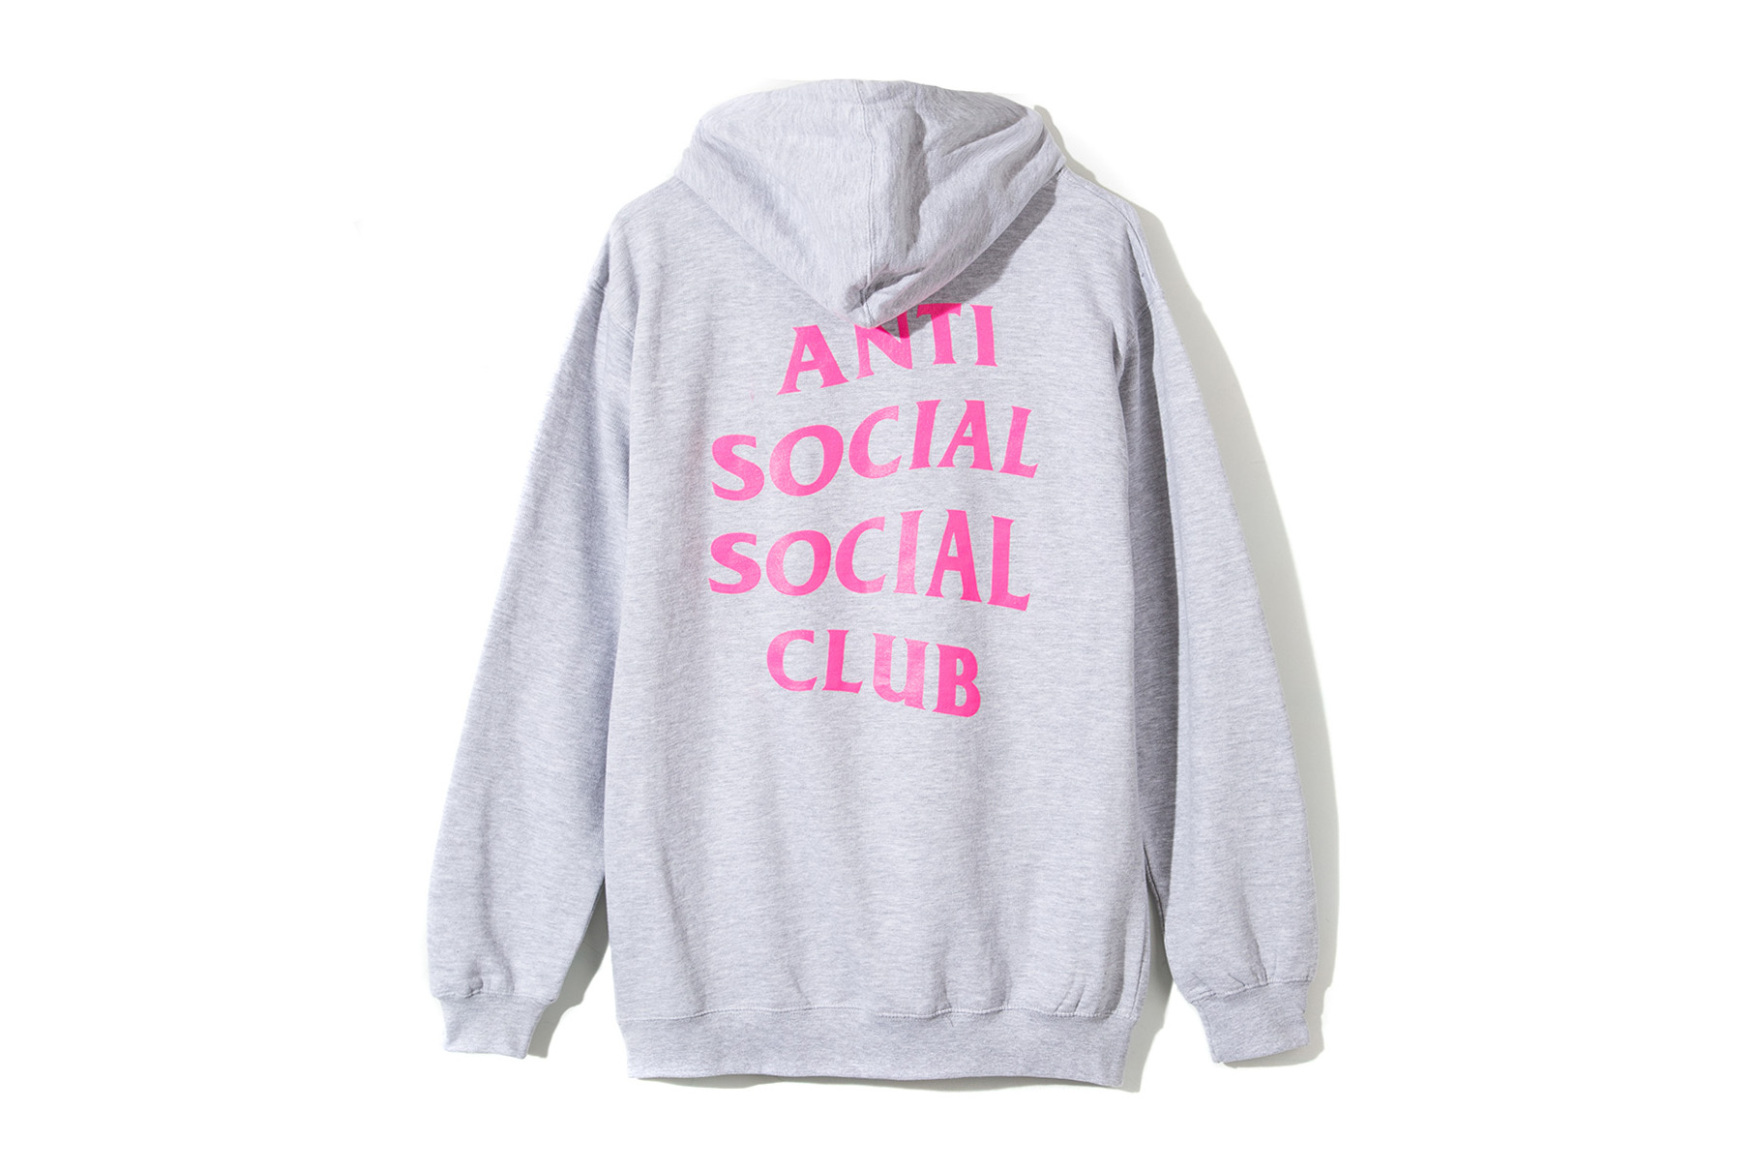 anti-social-social-club-2016-fall-winter-collection-11